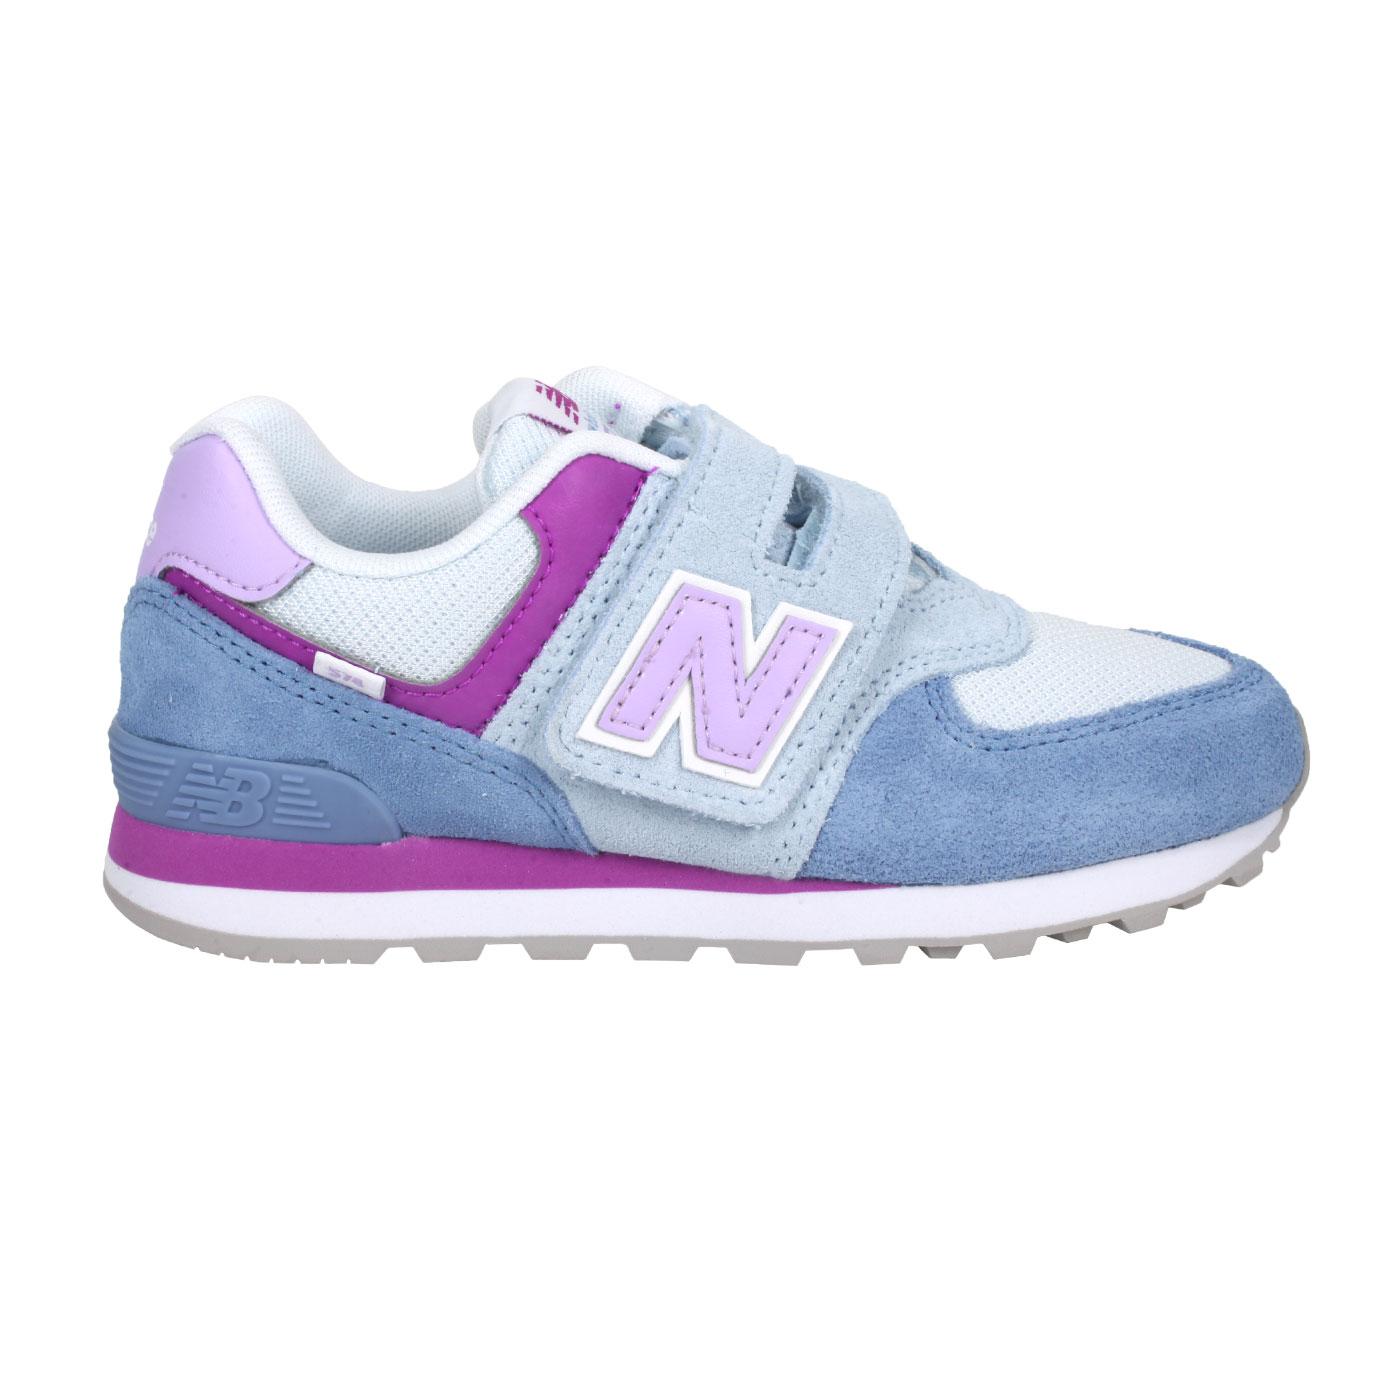 NEW BALANCE 中童休閒運動鞋-WIDE PV574SL2 - 藍紫白